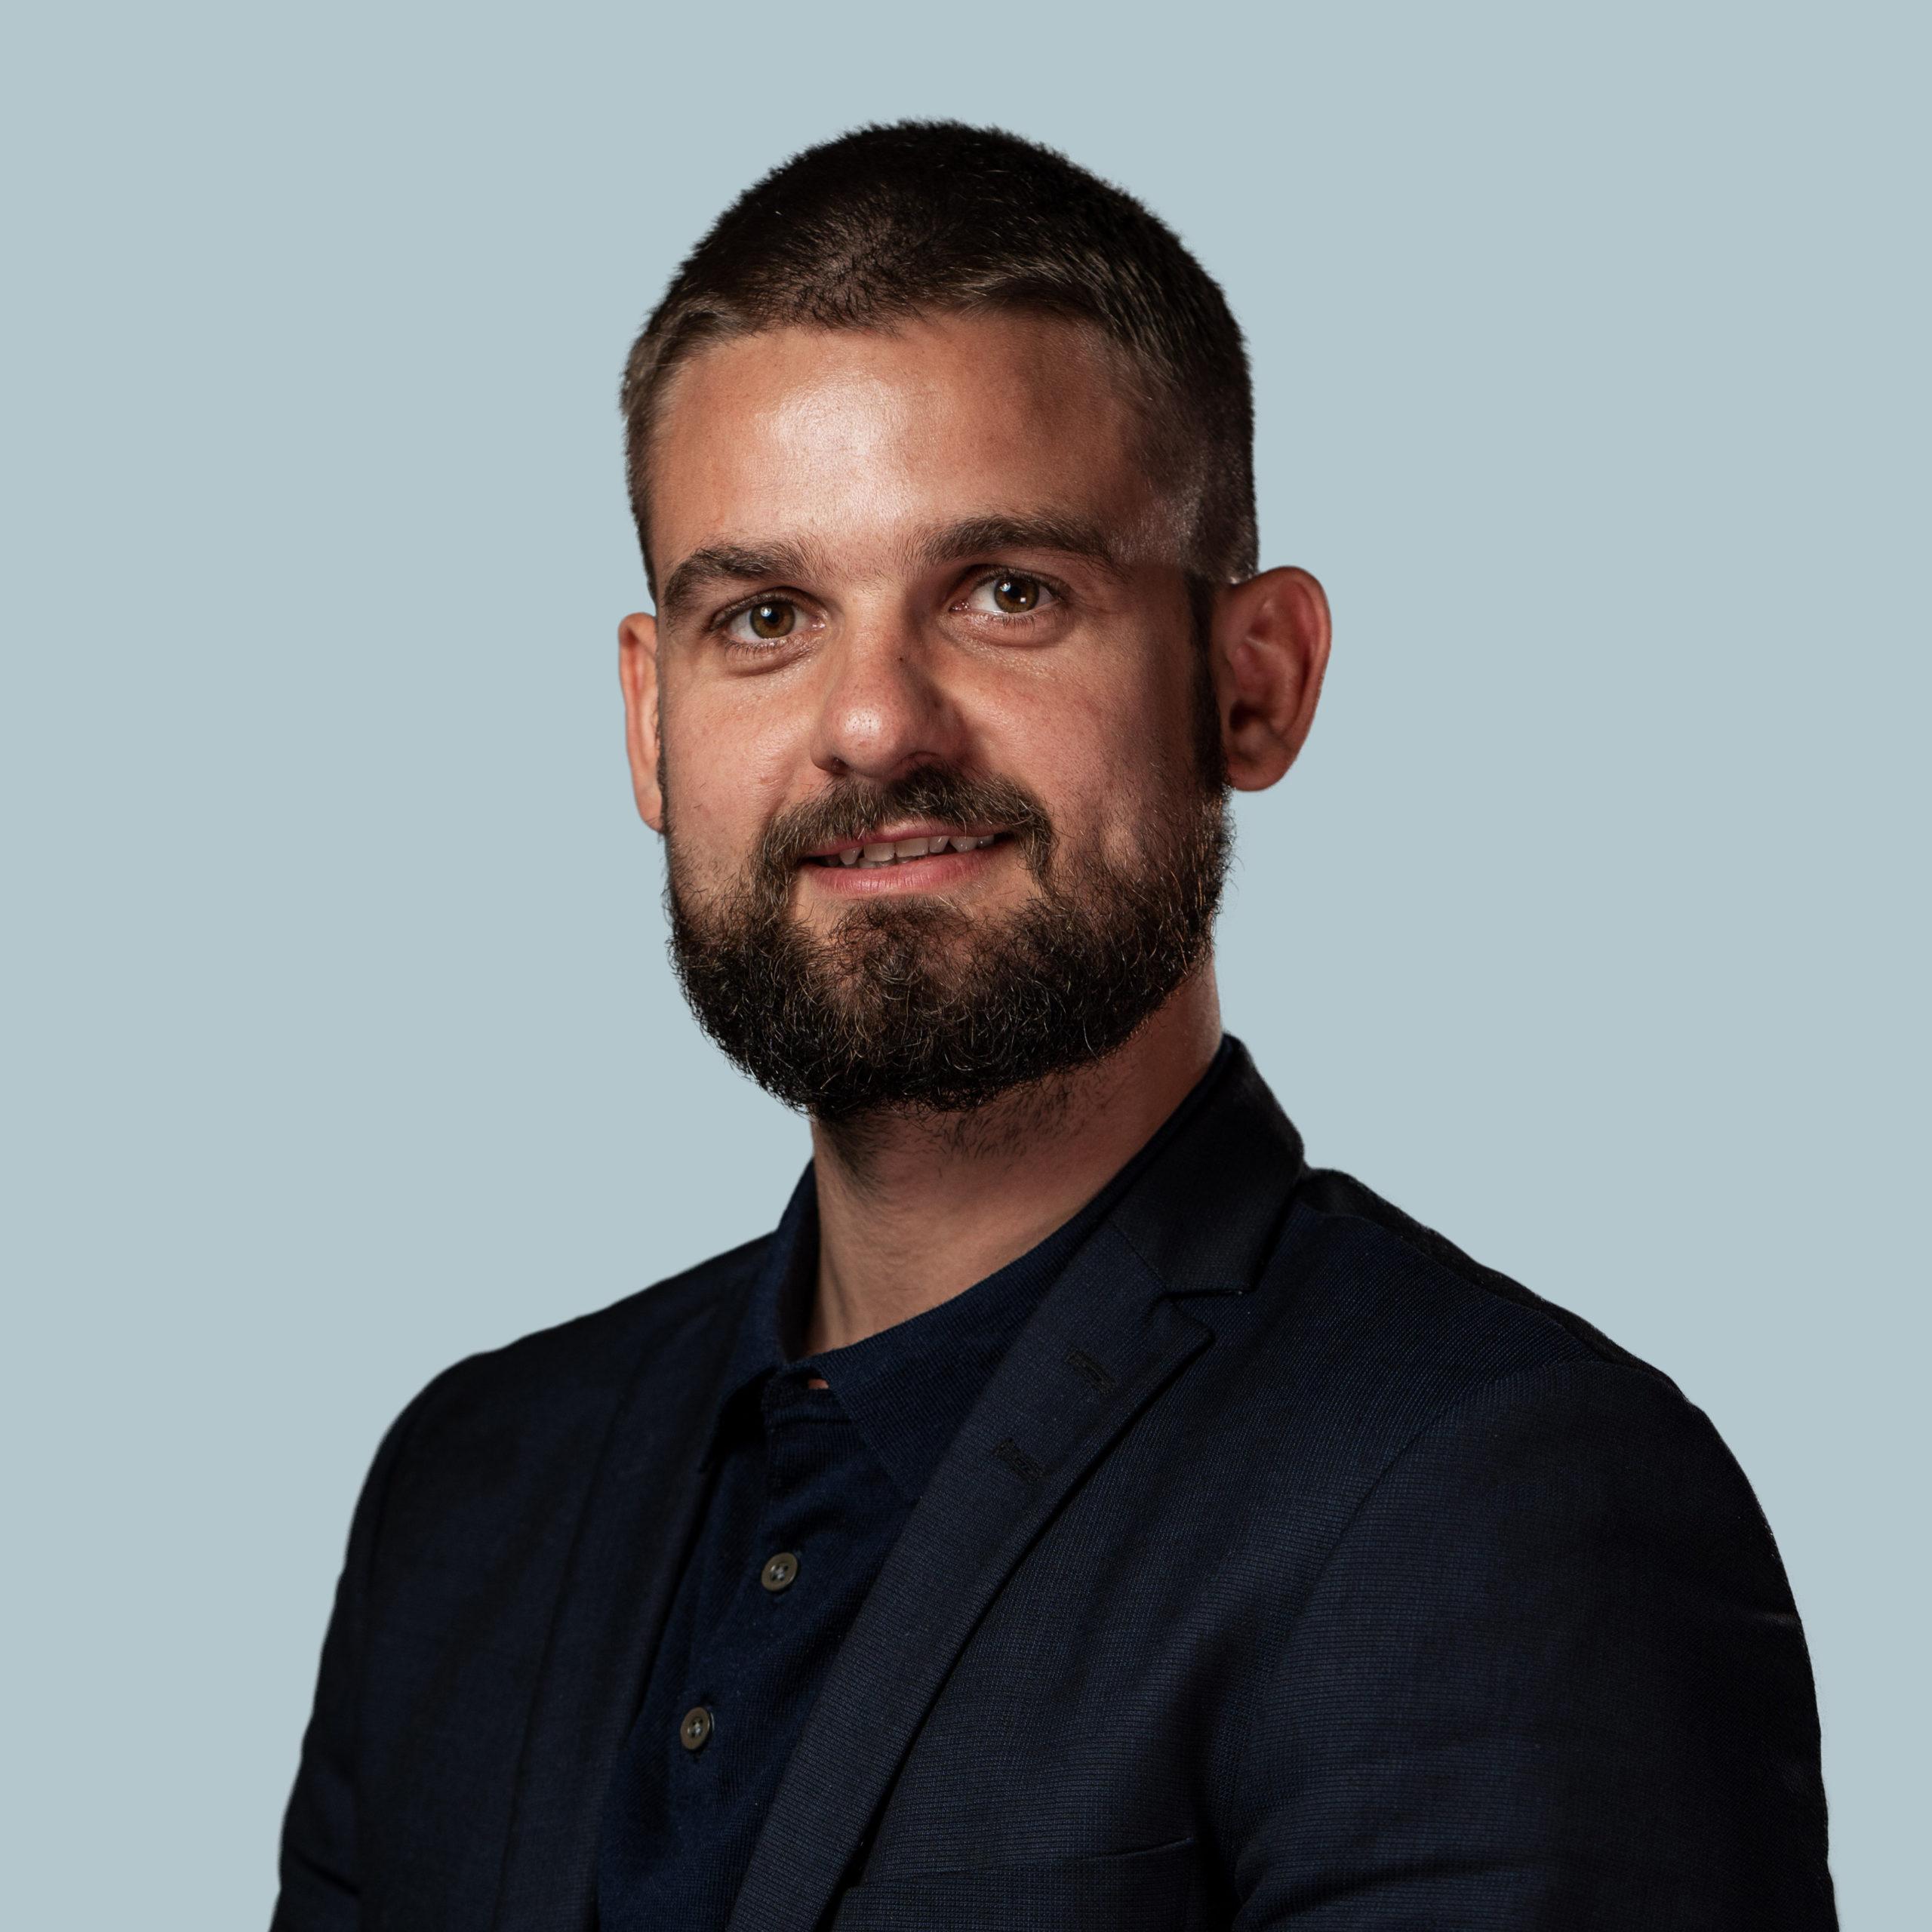 Martin Nyvang Mariussen